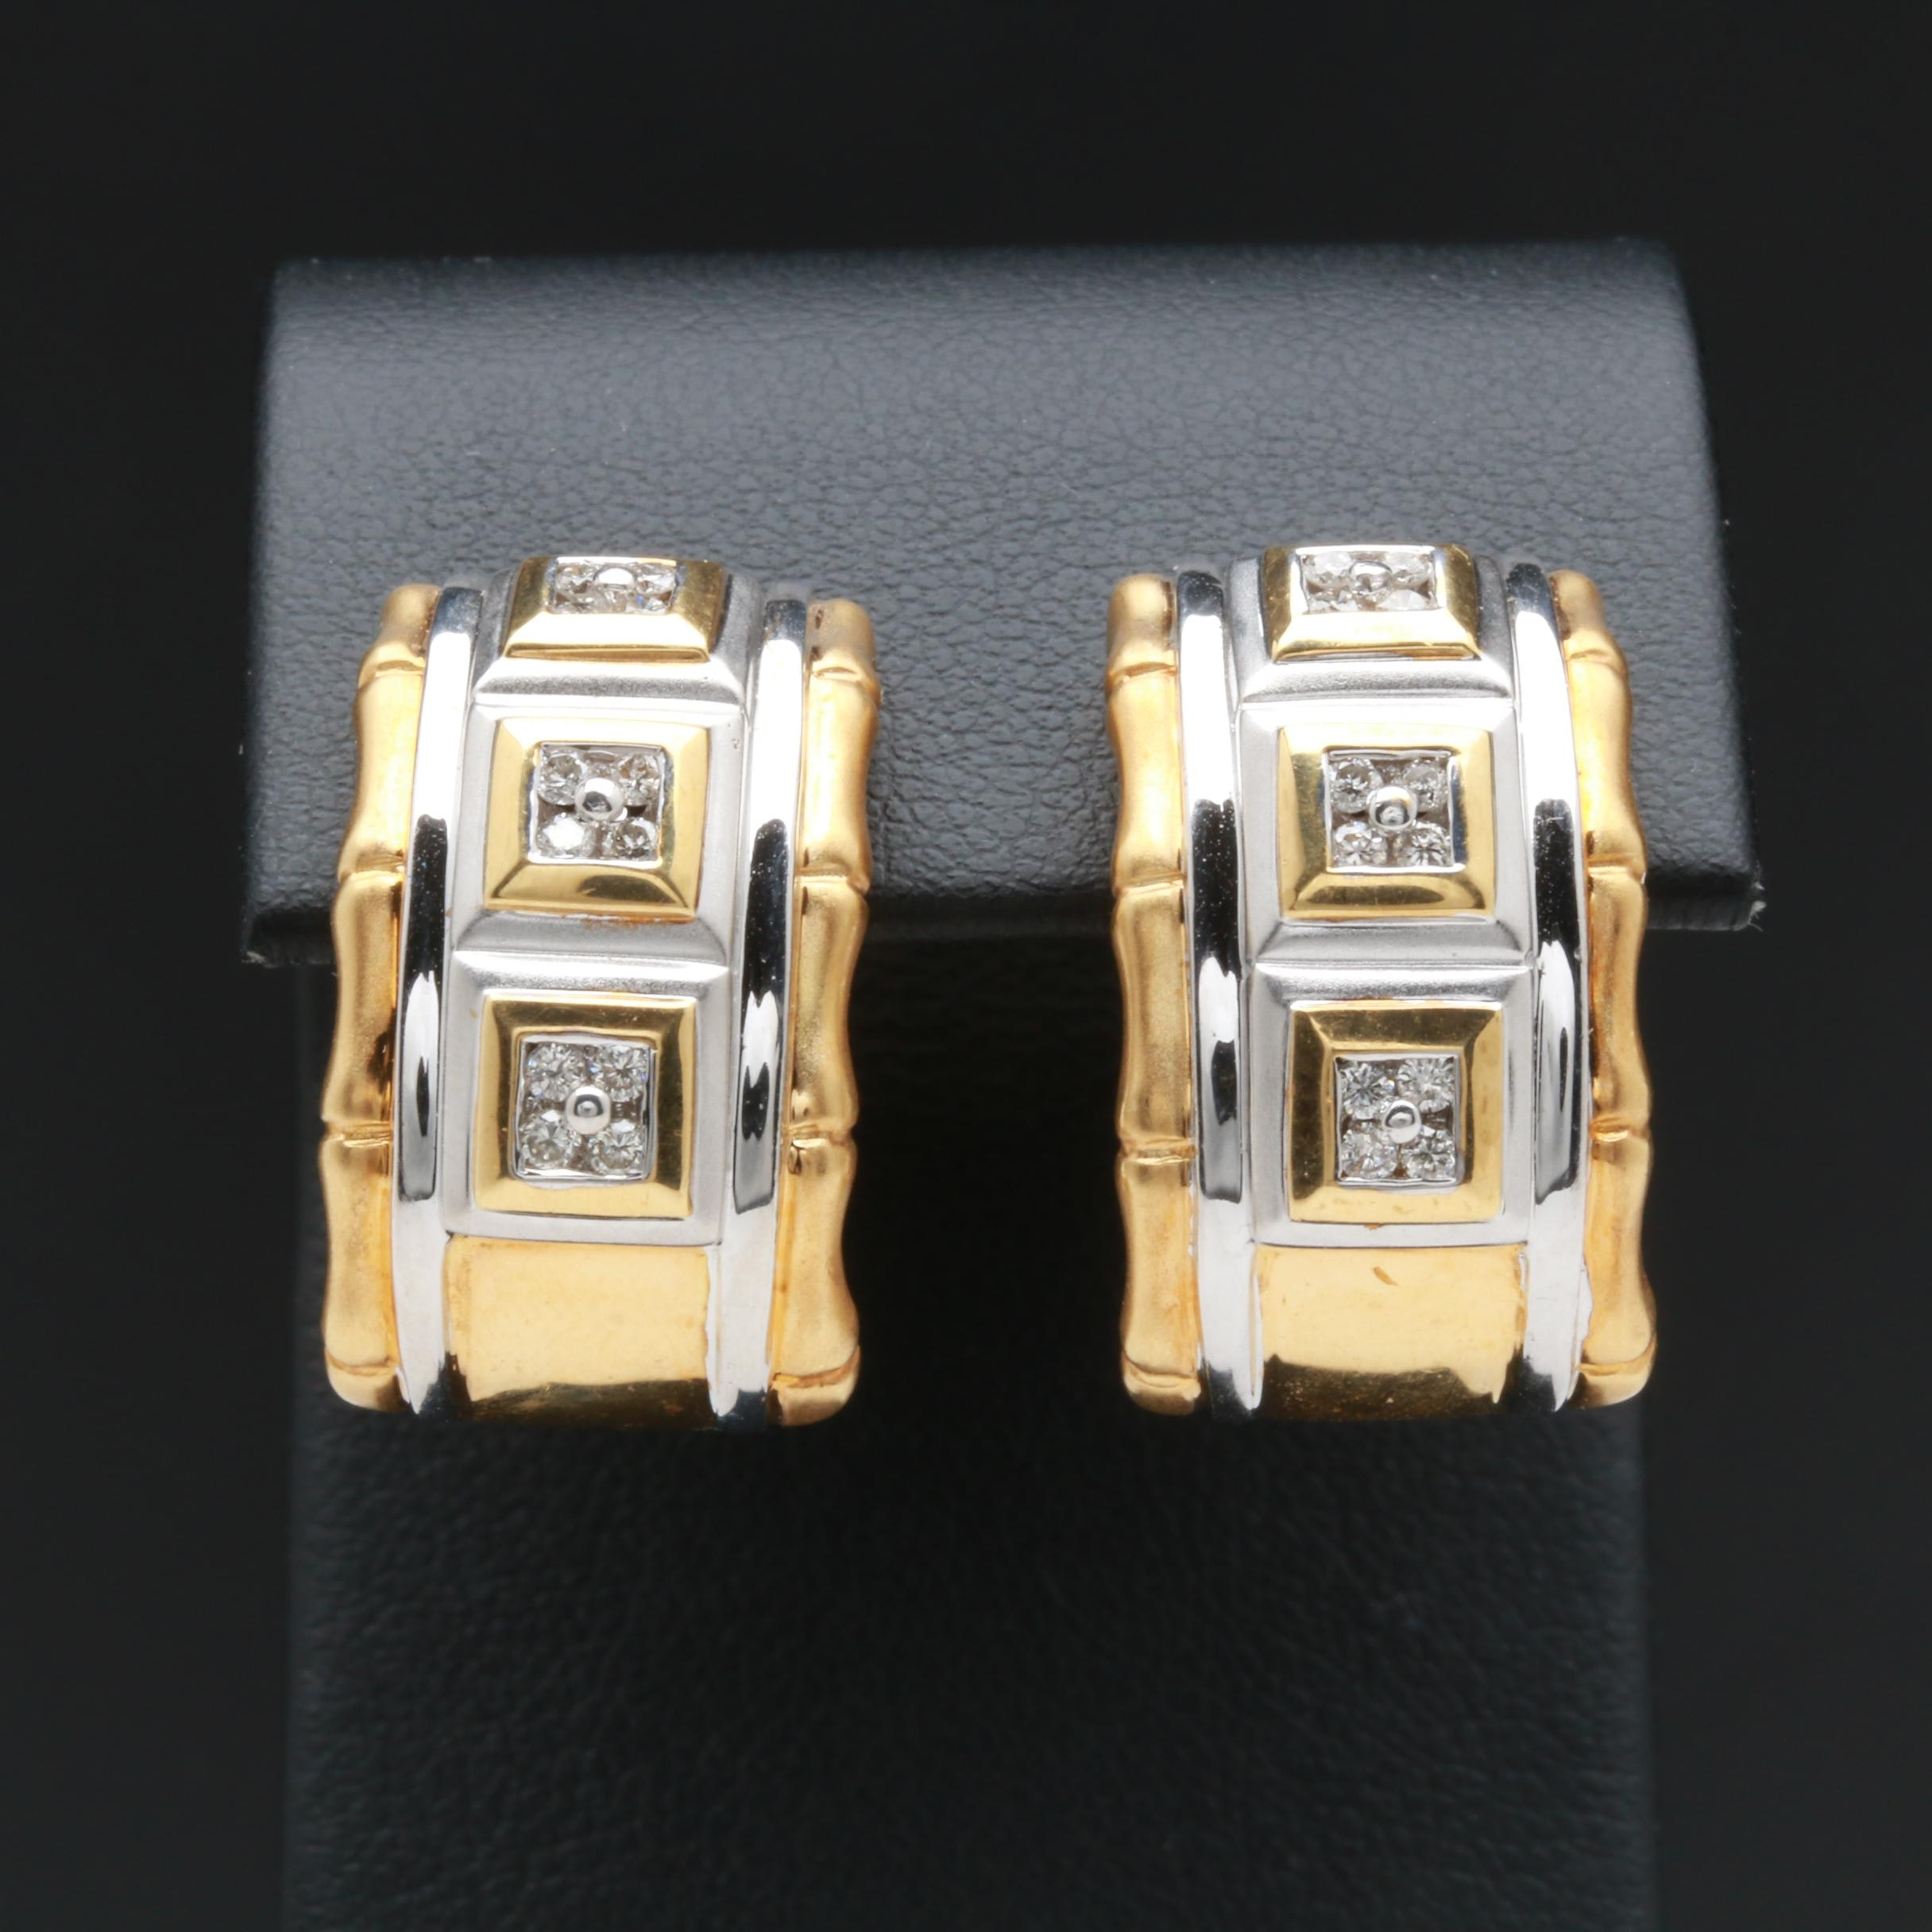 18K White and Yellow Gold Diamond Half Hoop Earrings